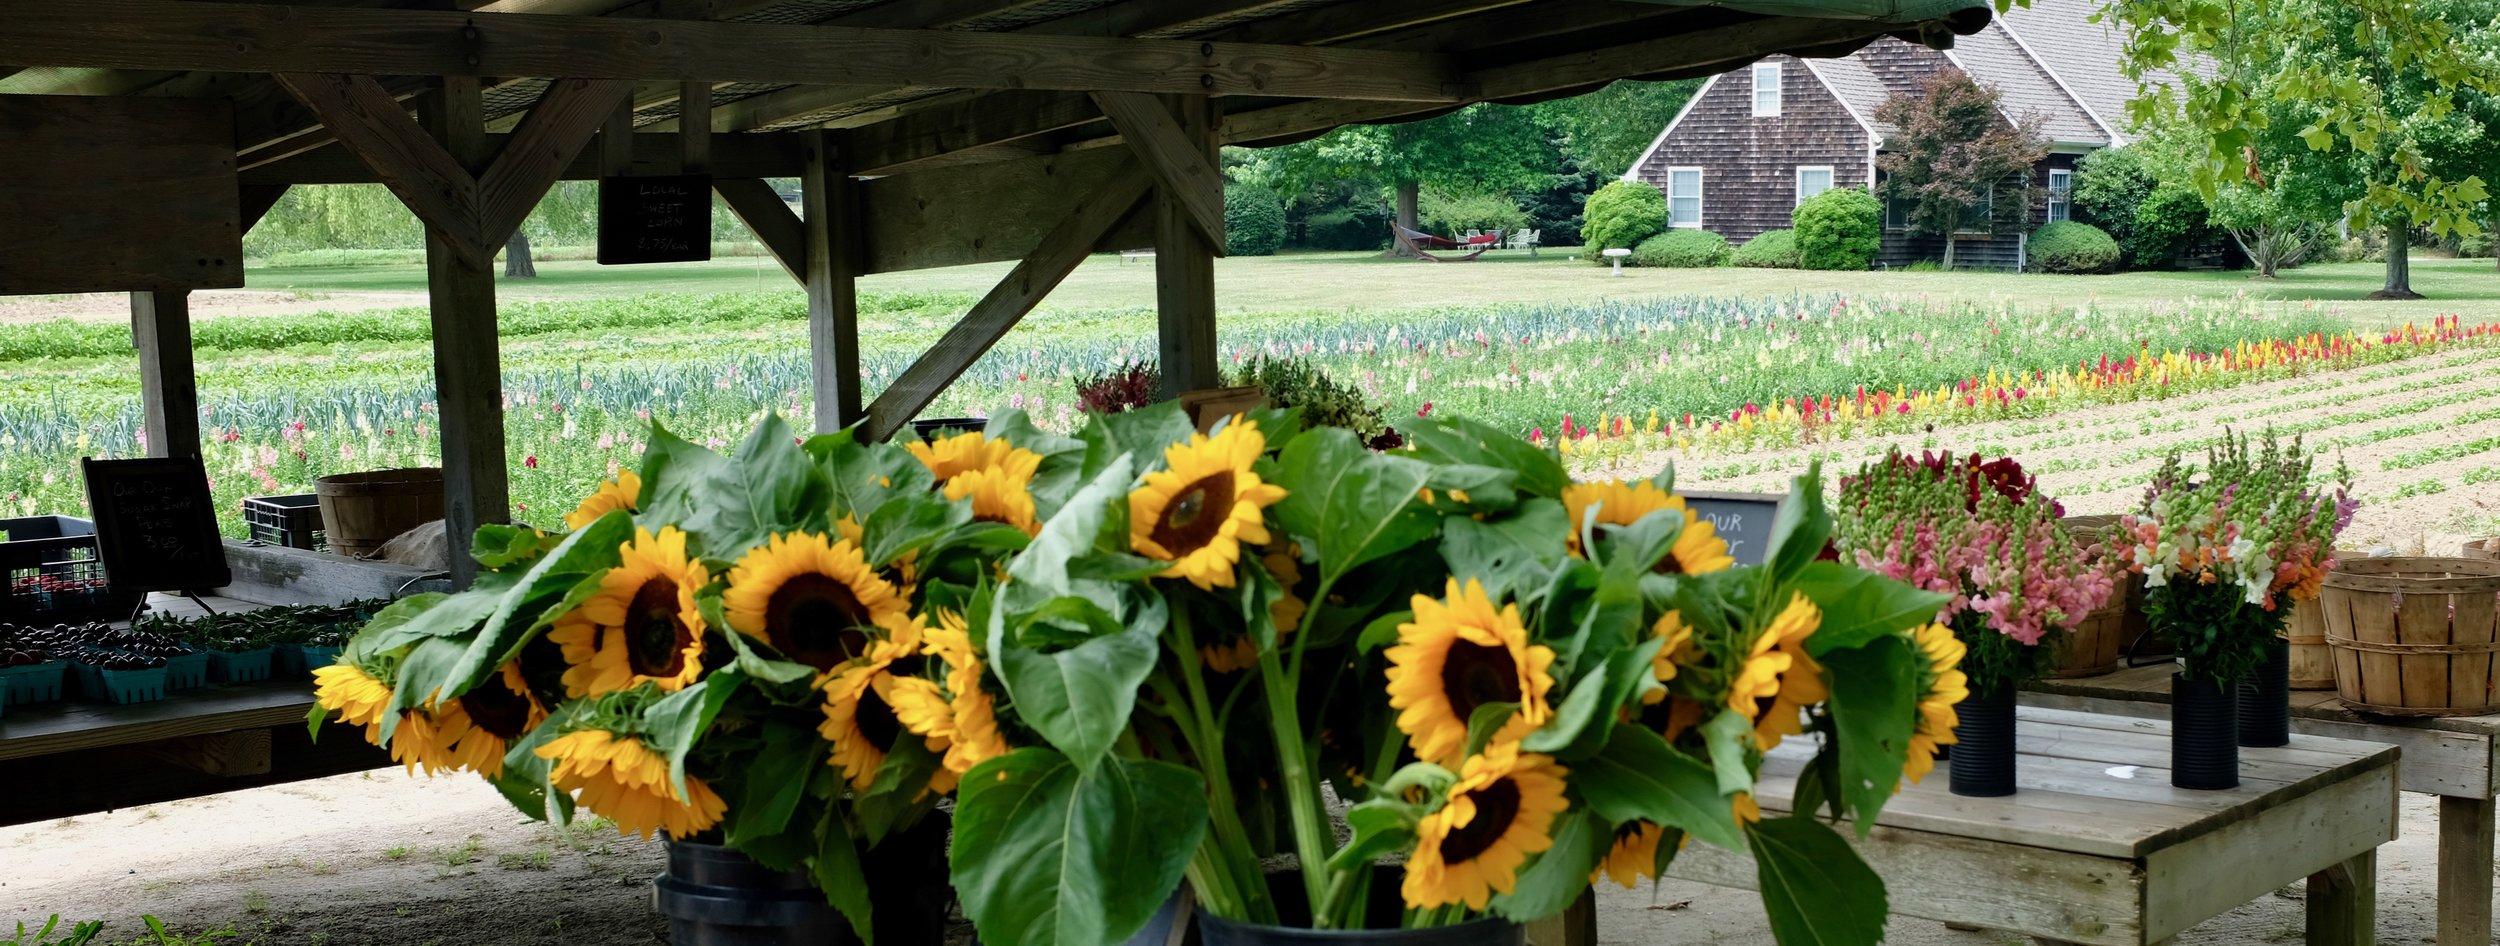 Montauk Long Island USA Reiseblog BeFifty